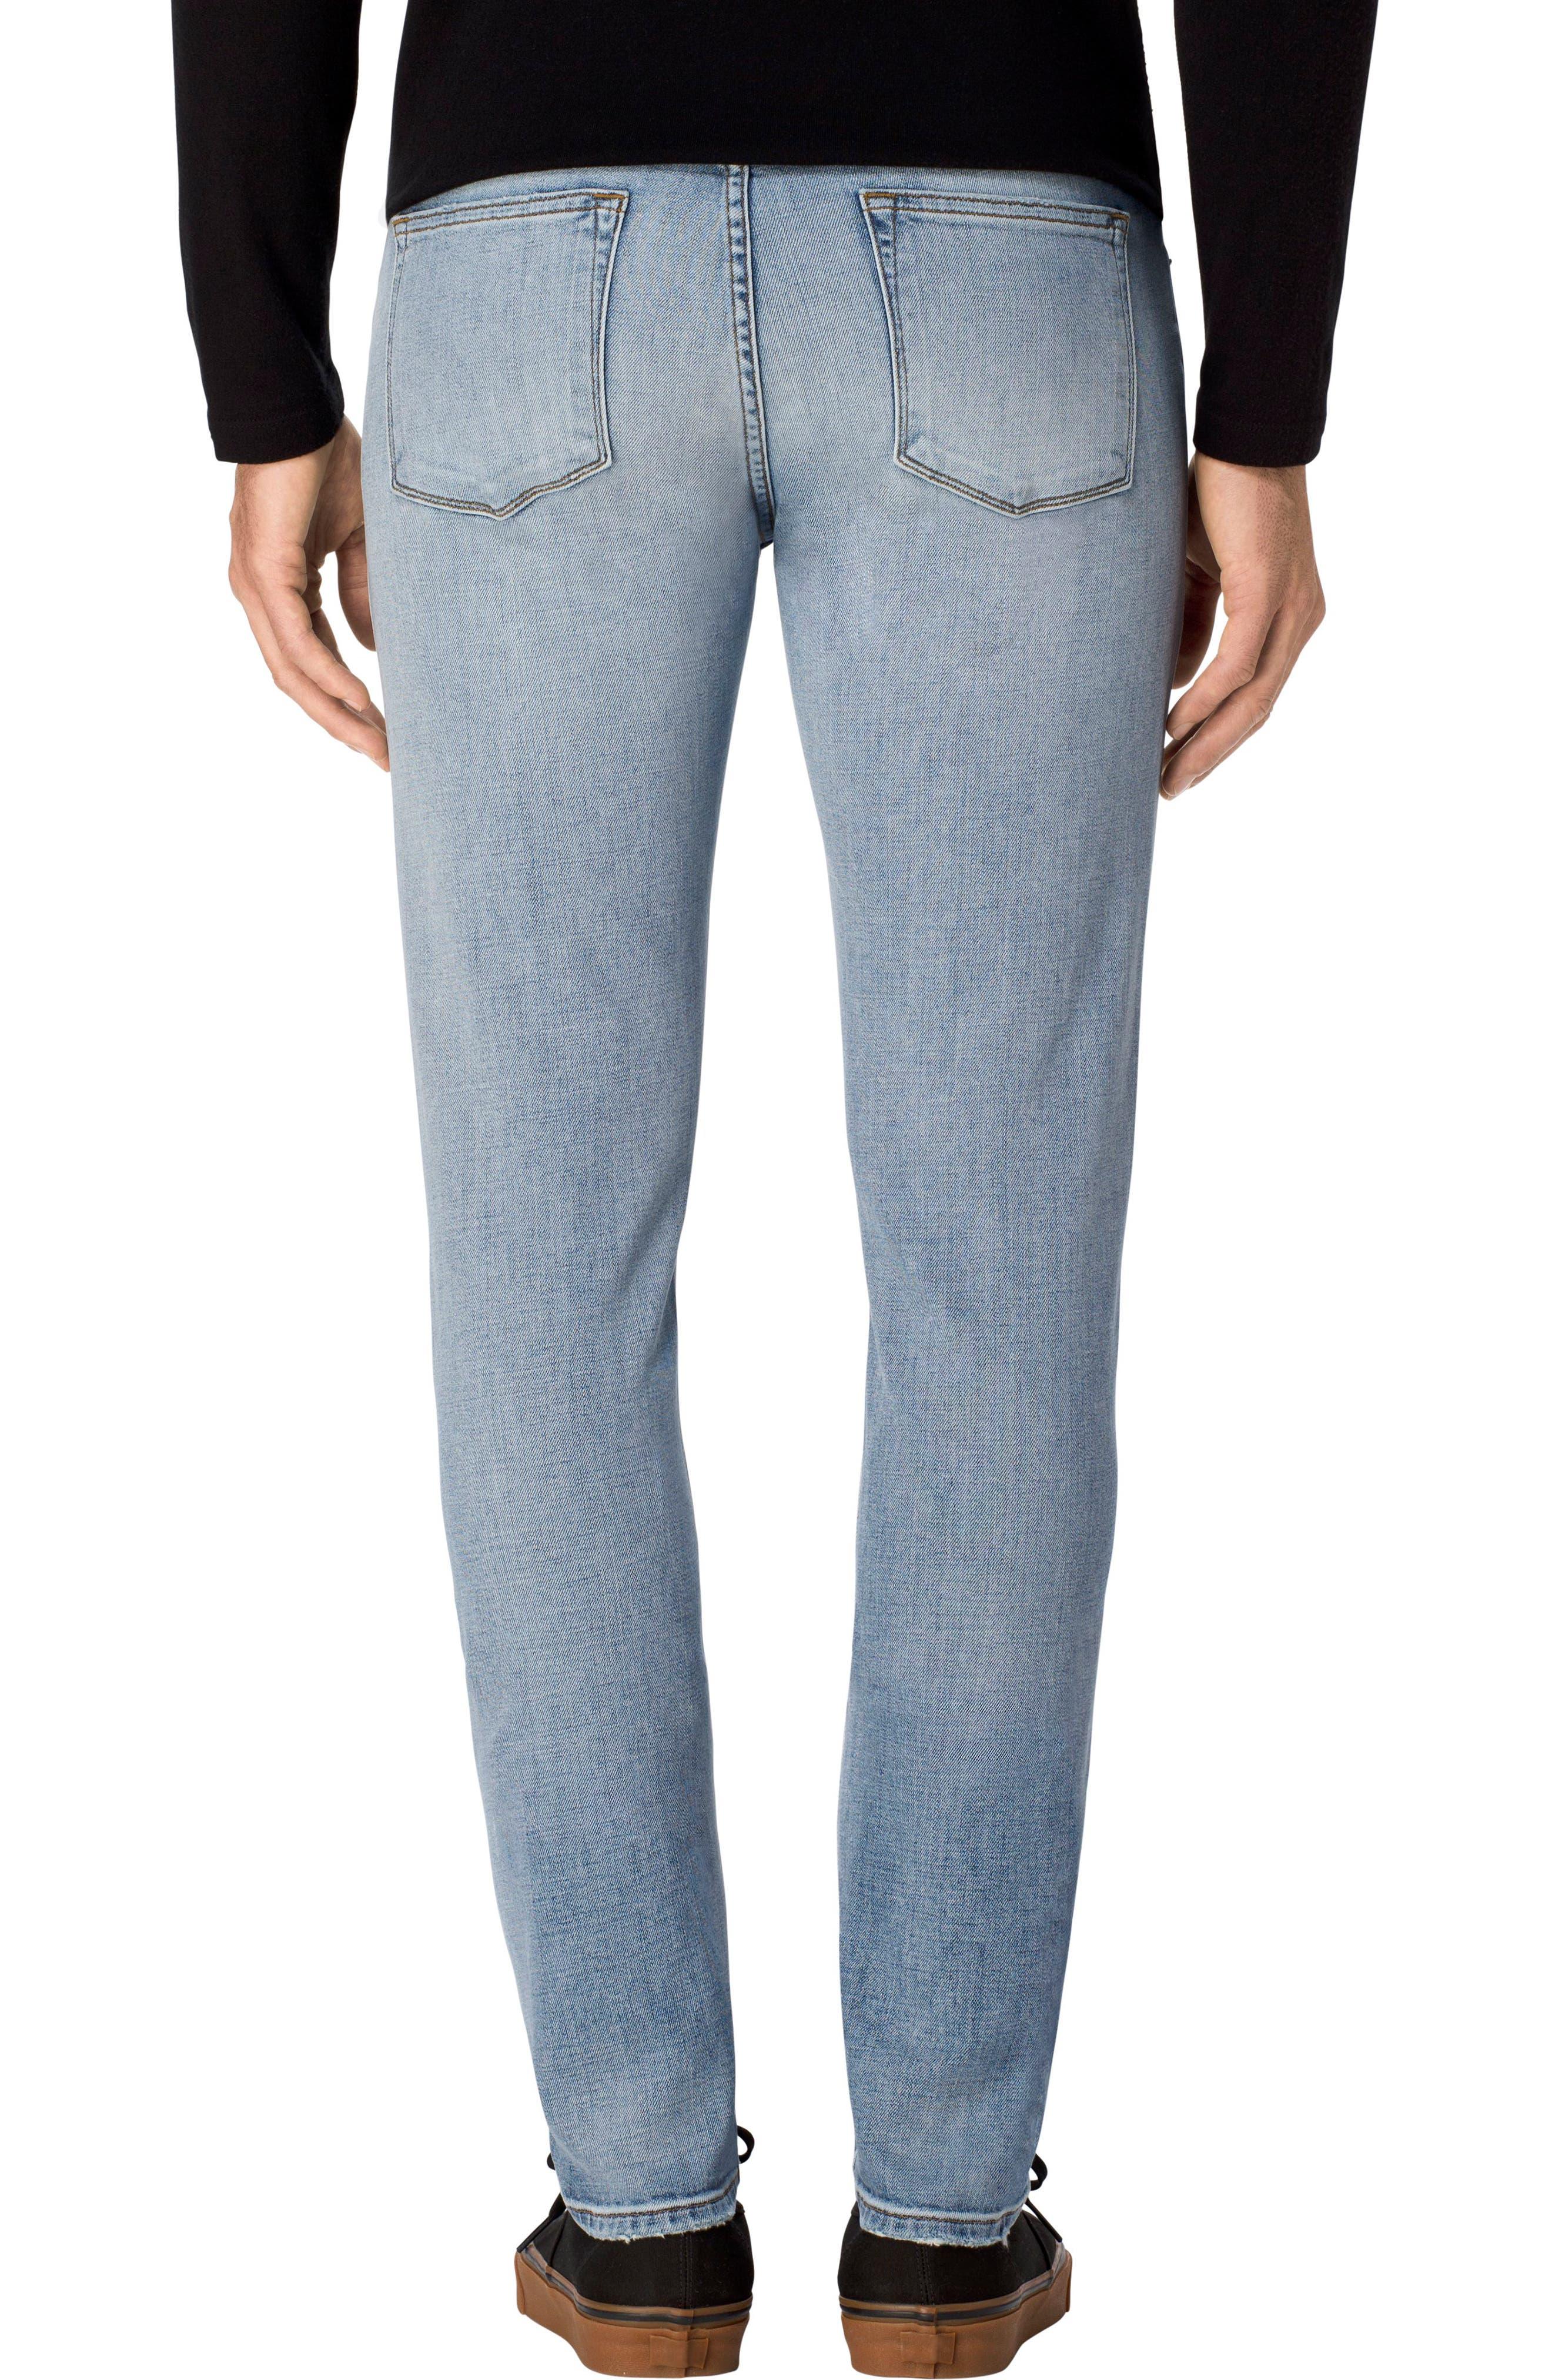 Mick Skinny Fit Jeans,                             Alternate thumbnail 2, color,                             450